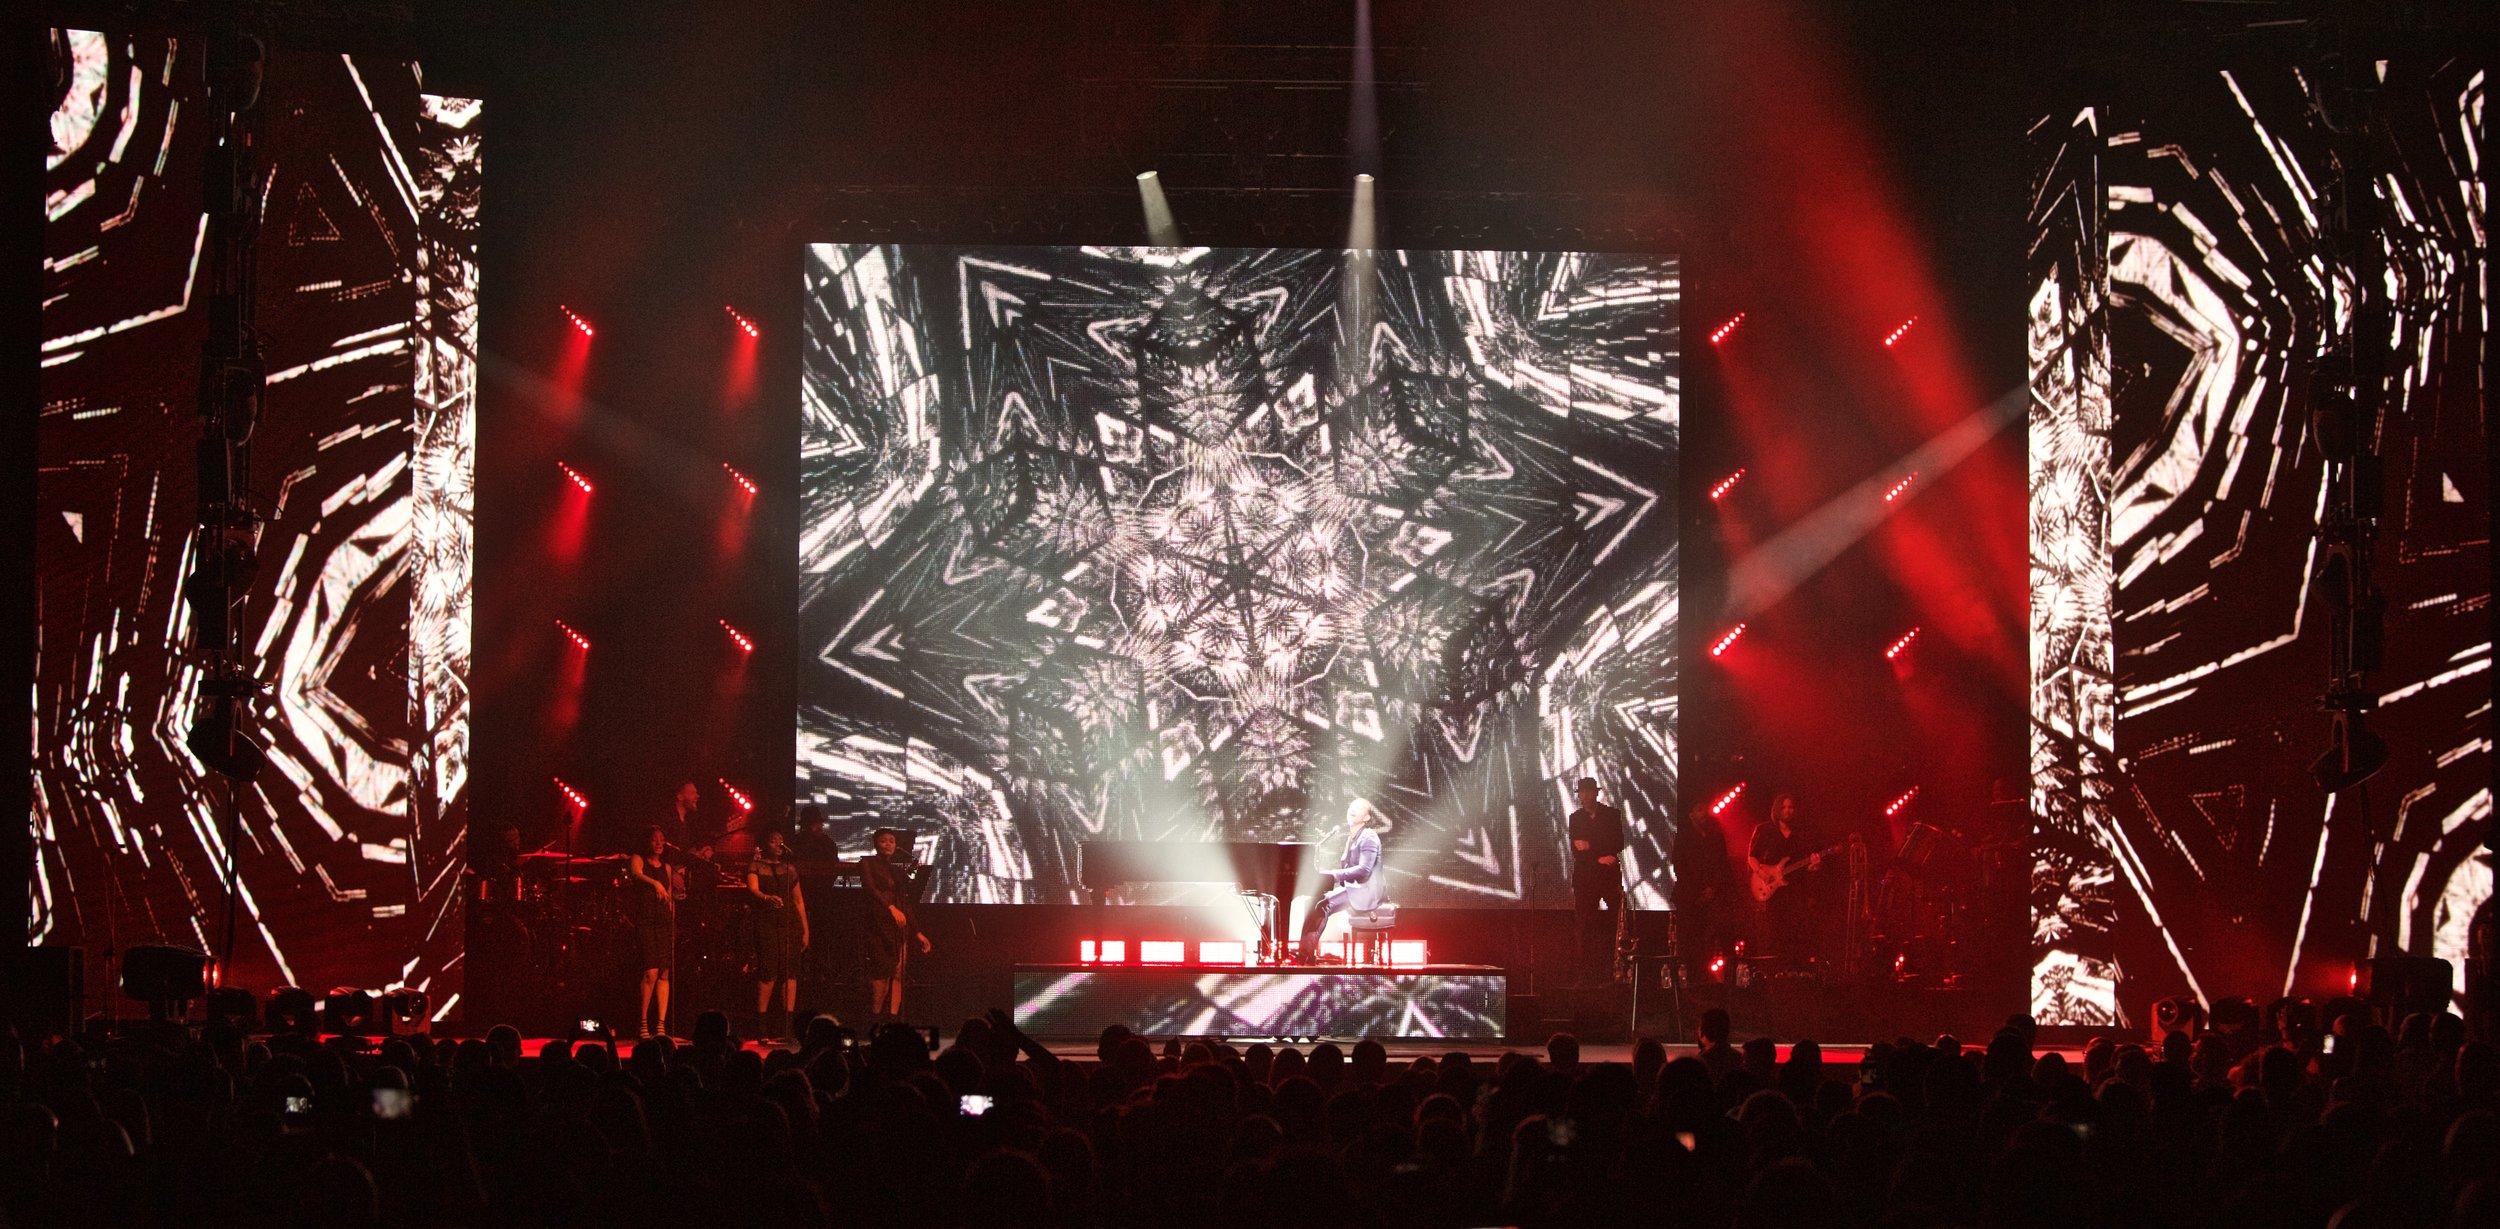 JohnLegend-US-TOUR-2017-Selects-v1+034.jpg